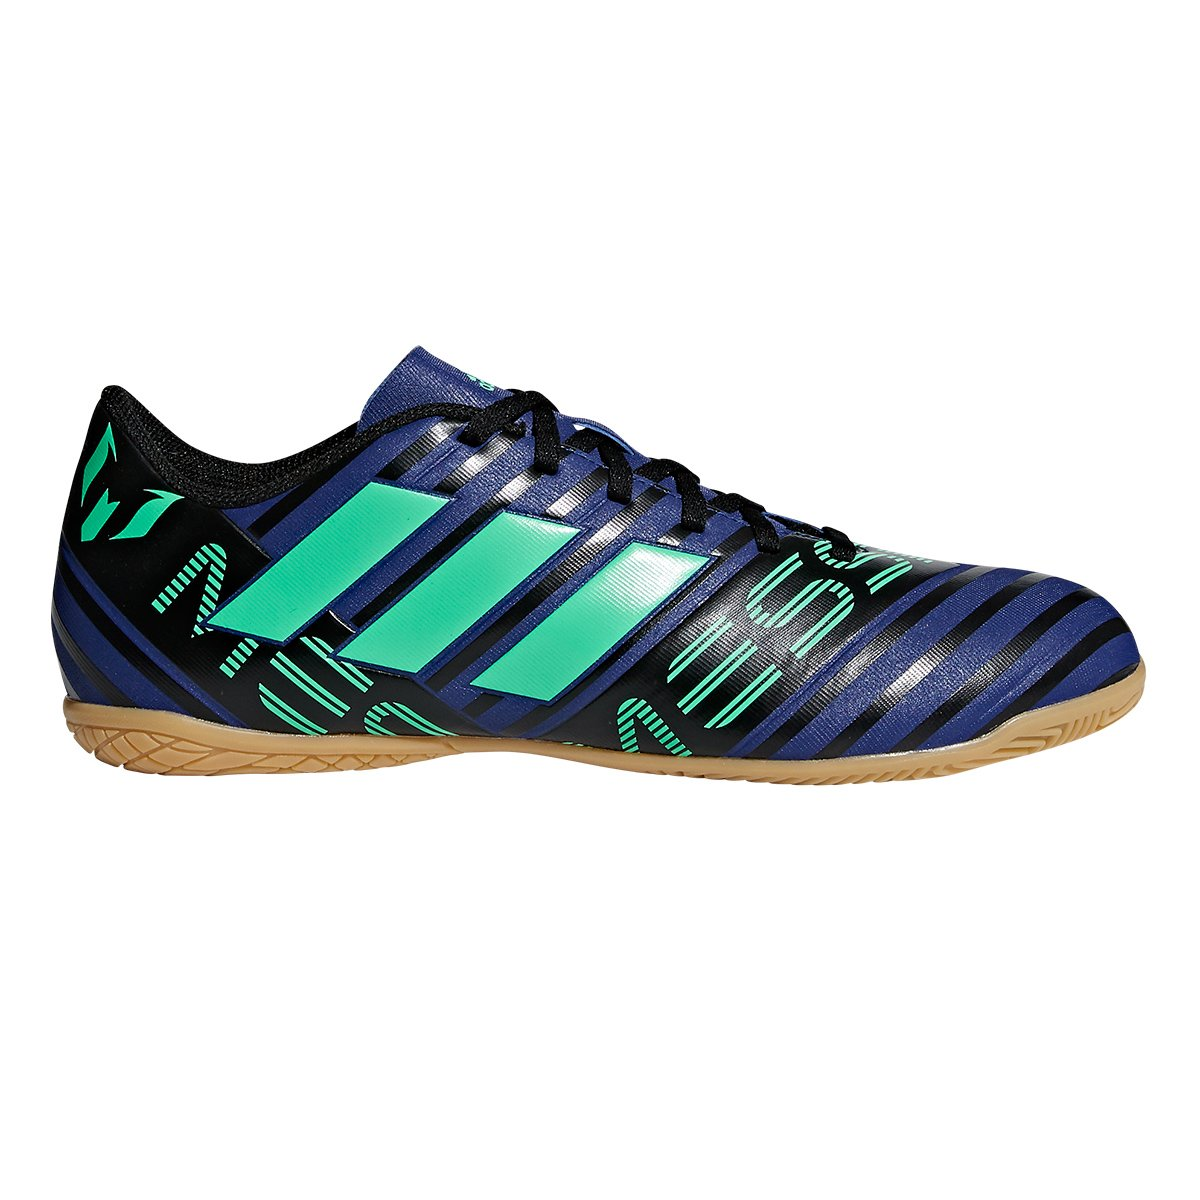 Chuteira Futsal Adidas Nemeziz Messi 17.4 IN - Marinho e Verde ... 168e4dc7603b2